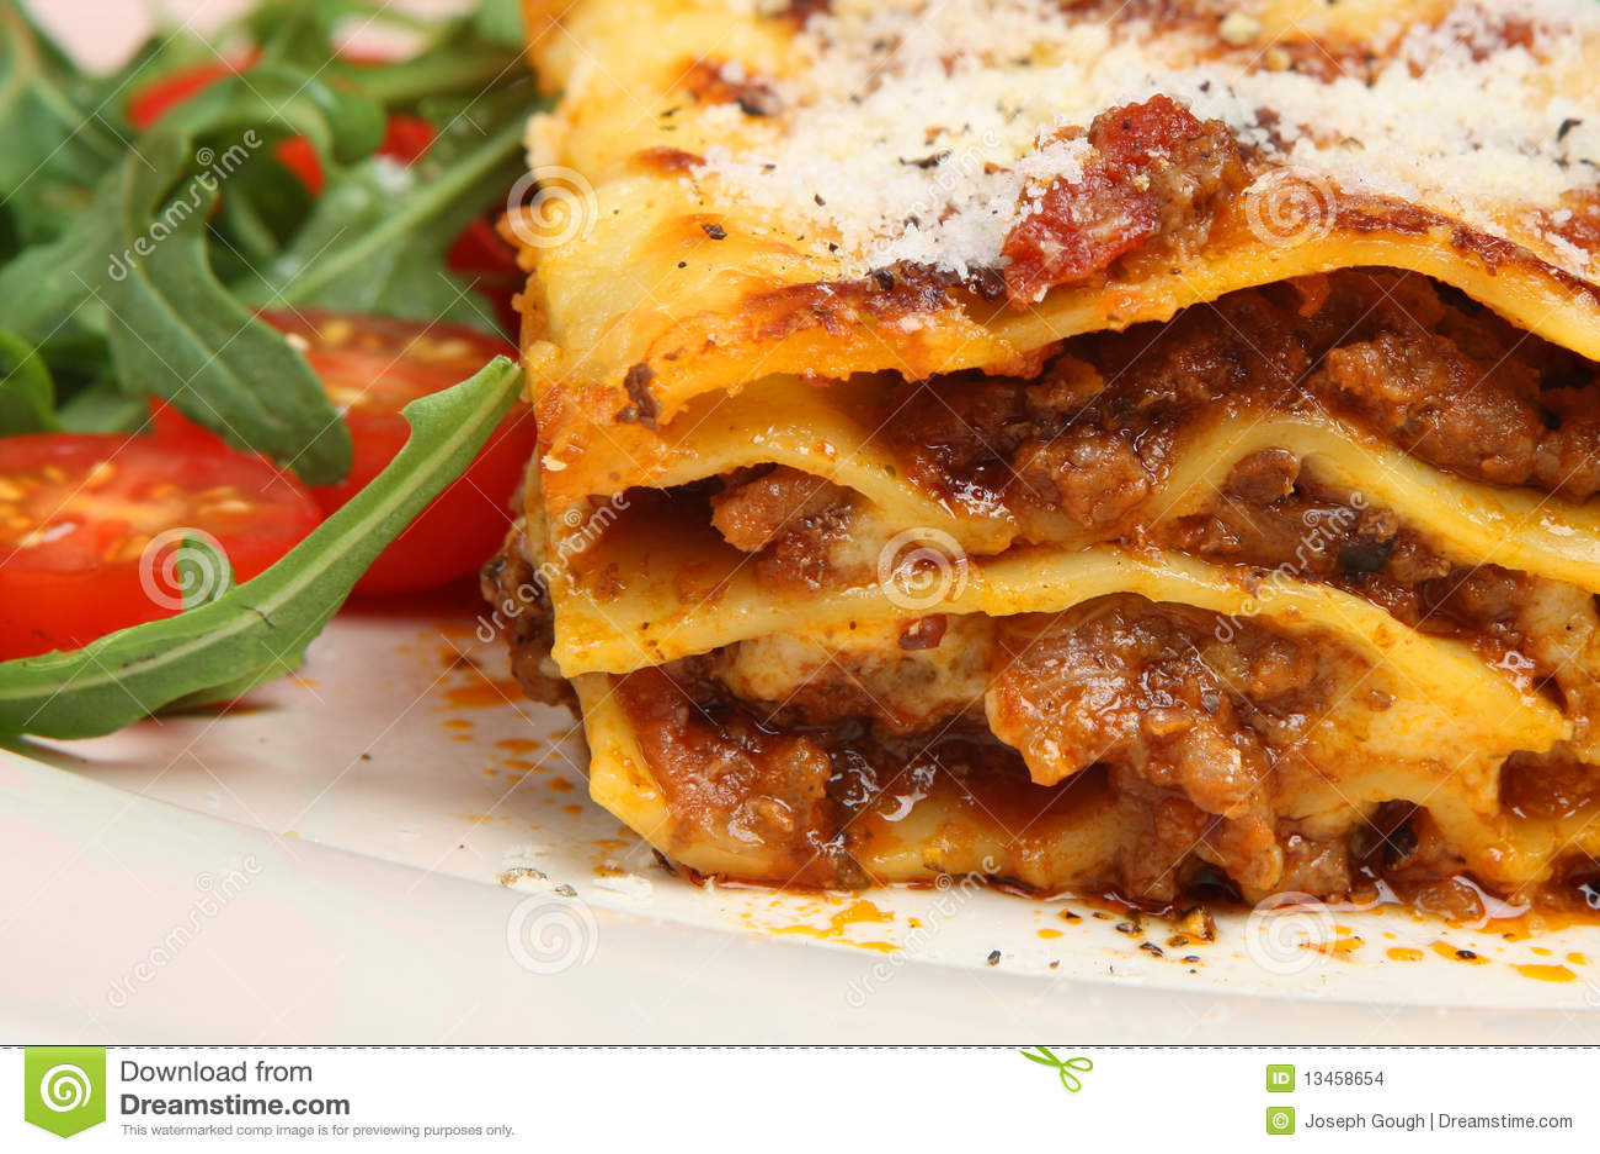 Lasagna Al Forno Stock Images - Image: 13458654